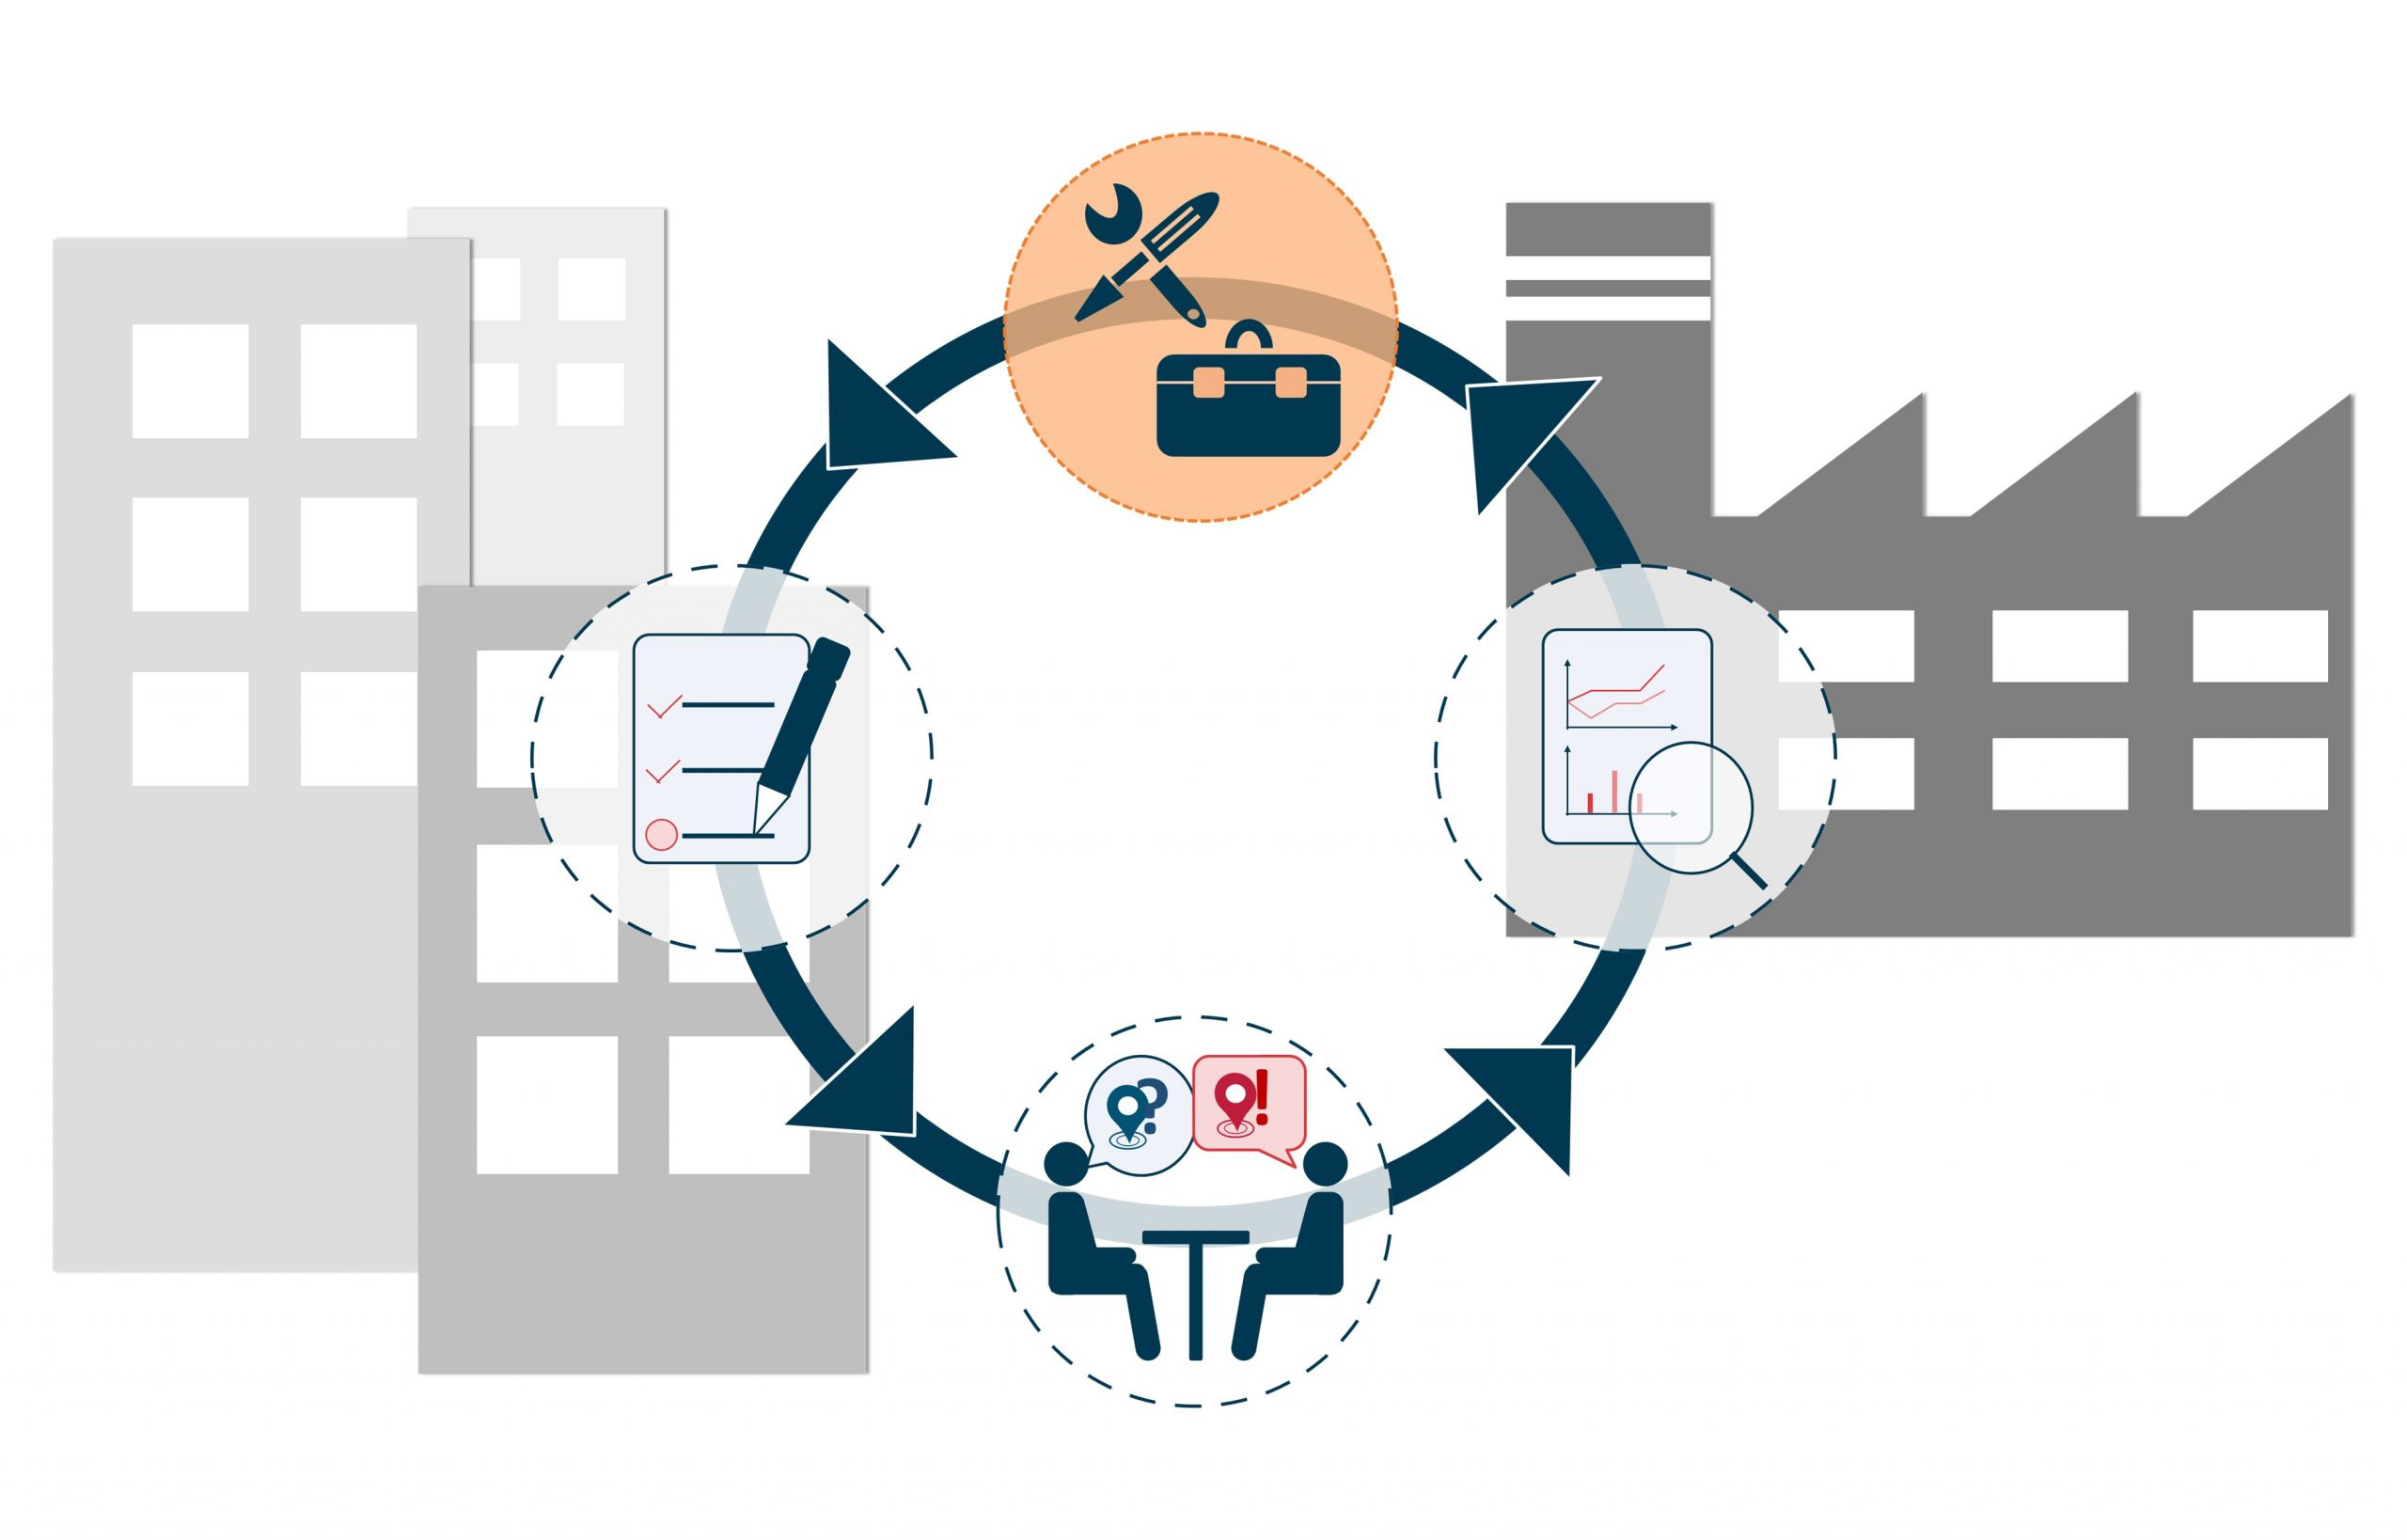 IFA_Fabrikplanung_Bild1_01